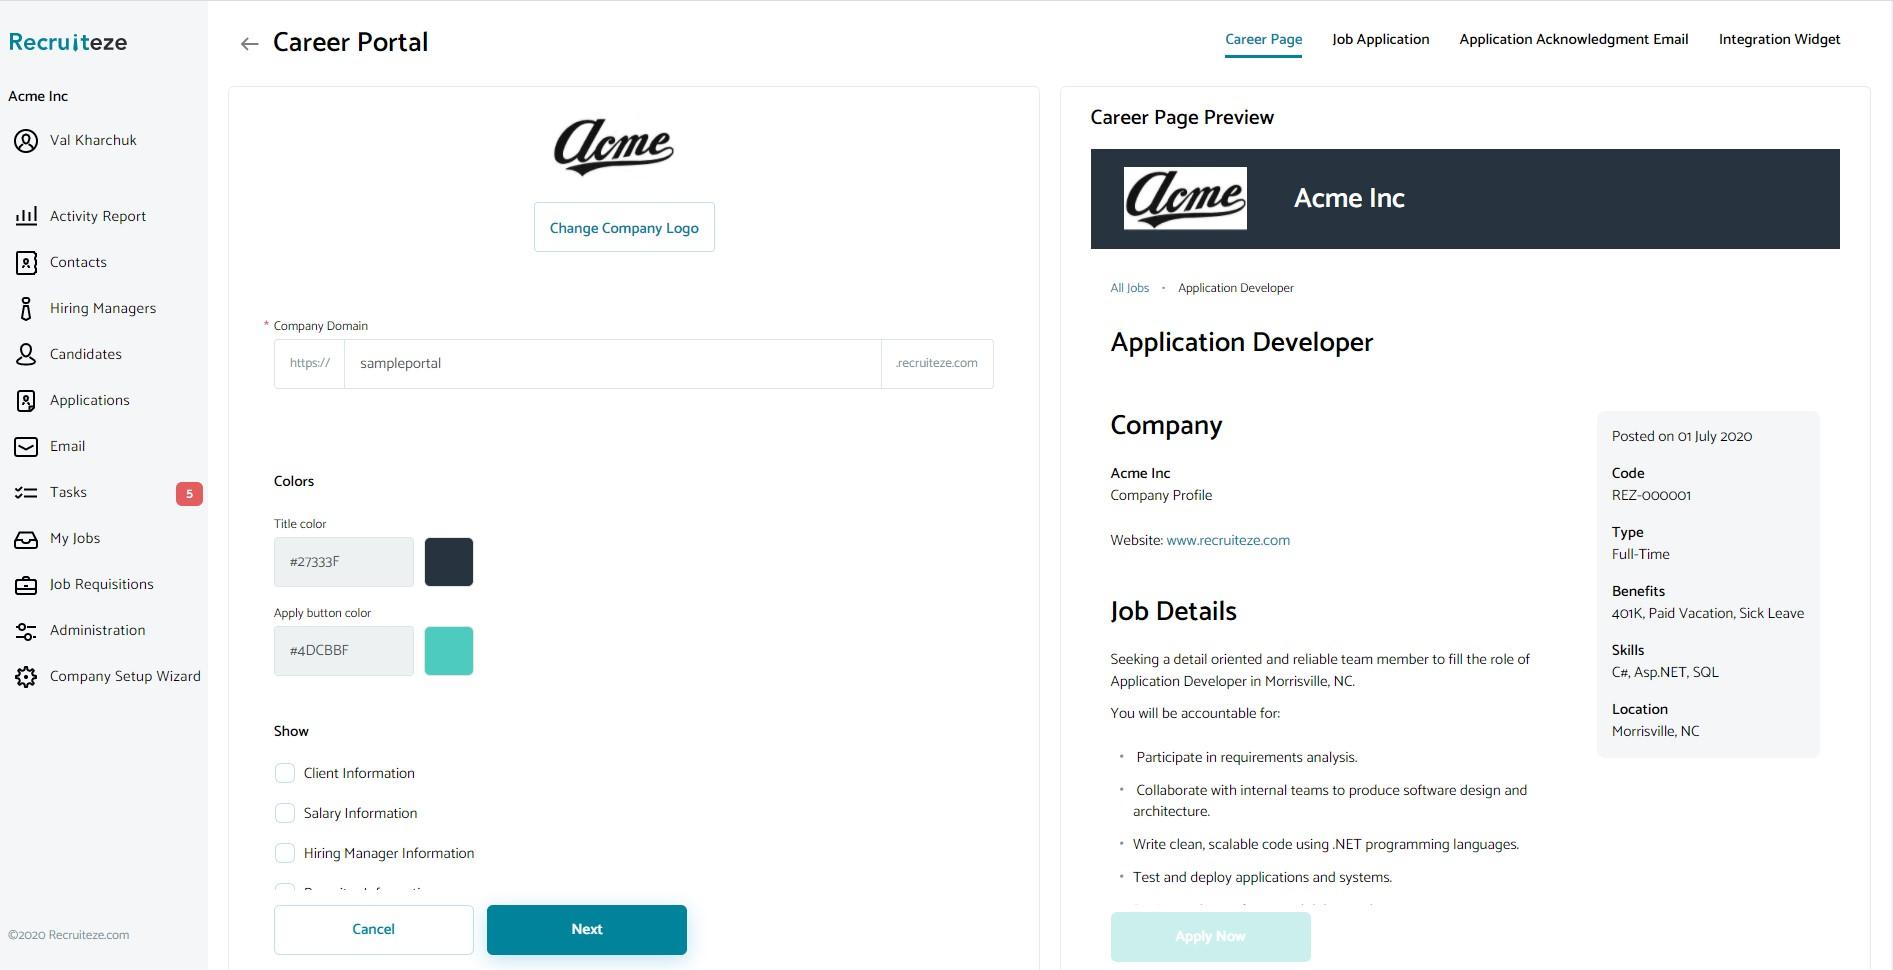 Recruiteze UI